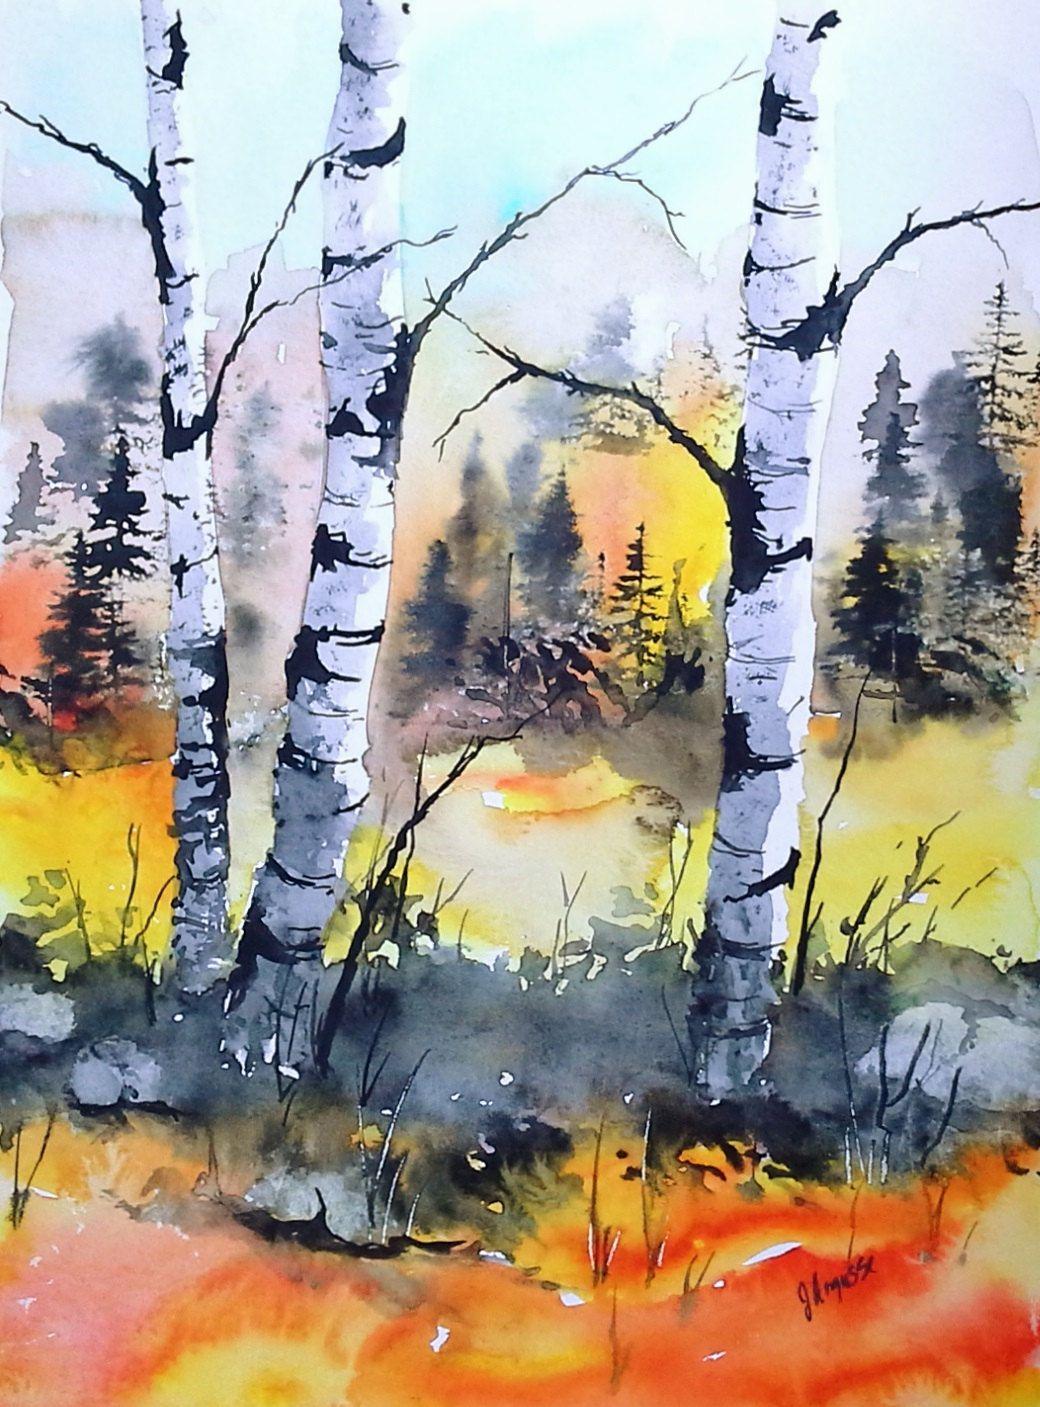 Original watercolor art for sale - Birch Tree Art Watercolor Original Landscape Original Painting Watercolor Painting Original Watercolor Birch Tree Art